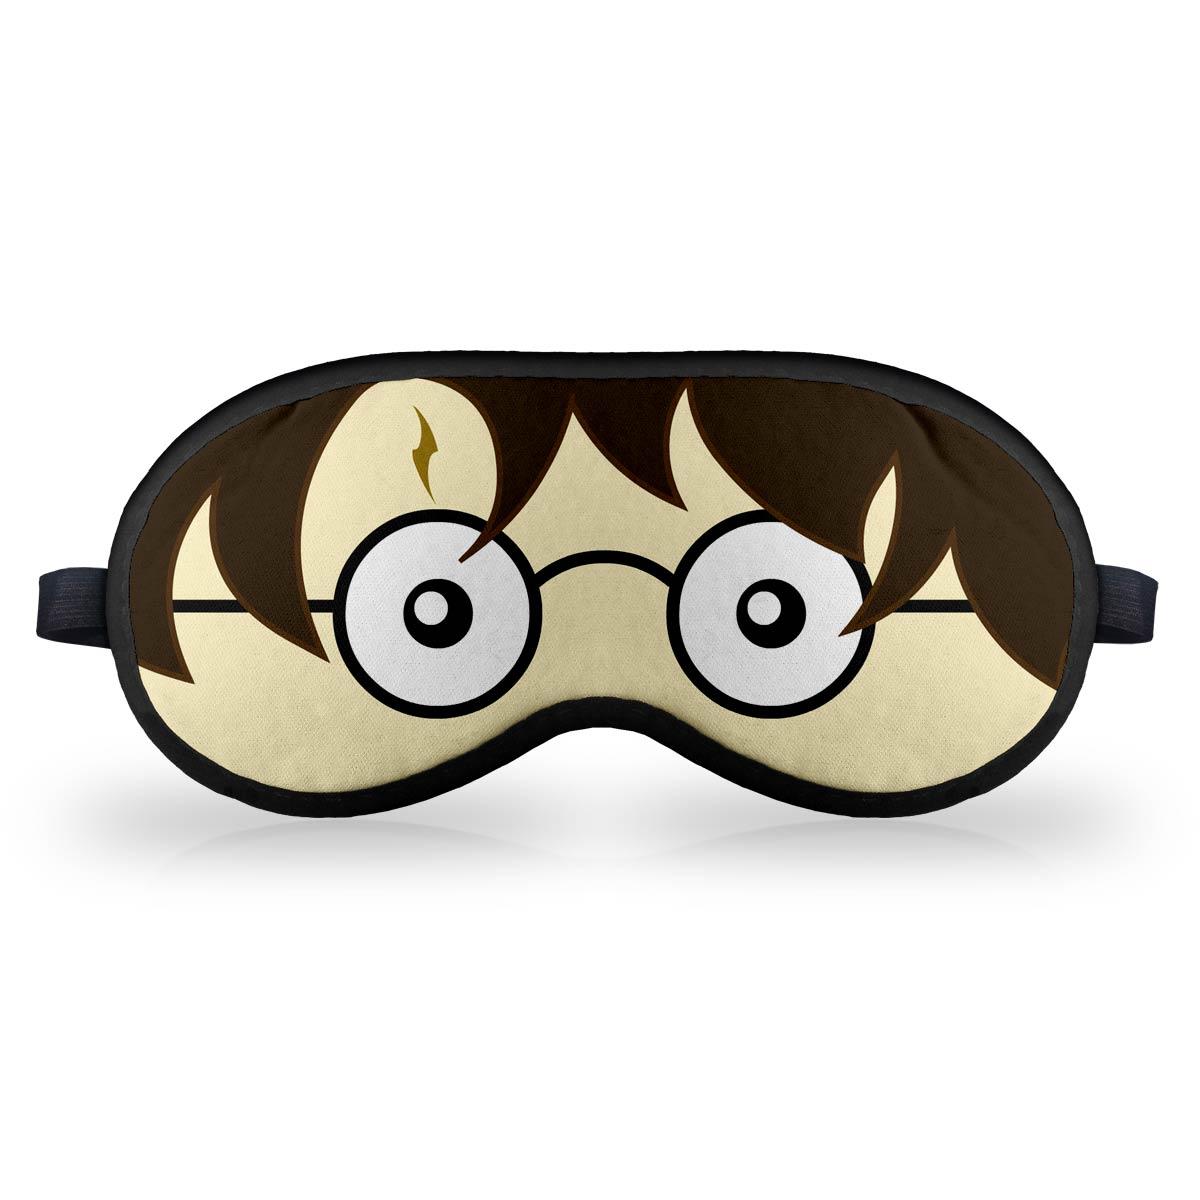 Máscara de Dormir em neoprene Bruxinho Harry